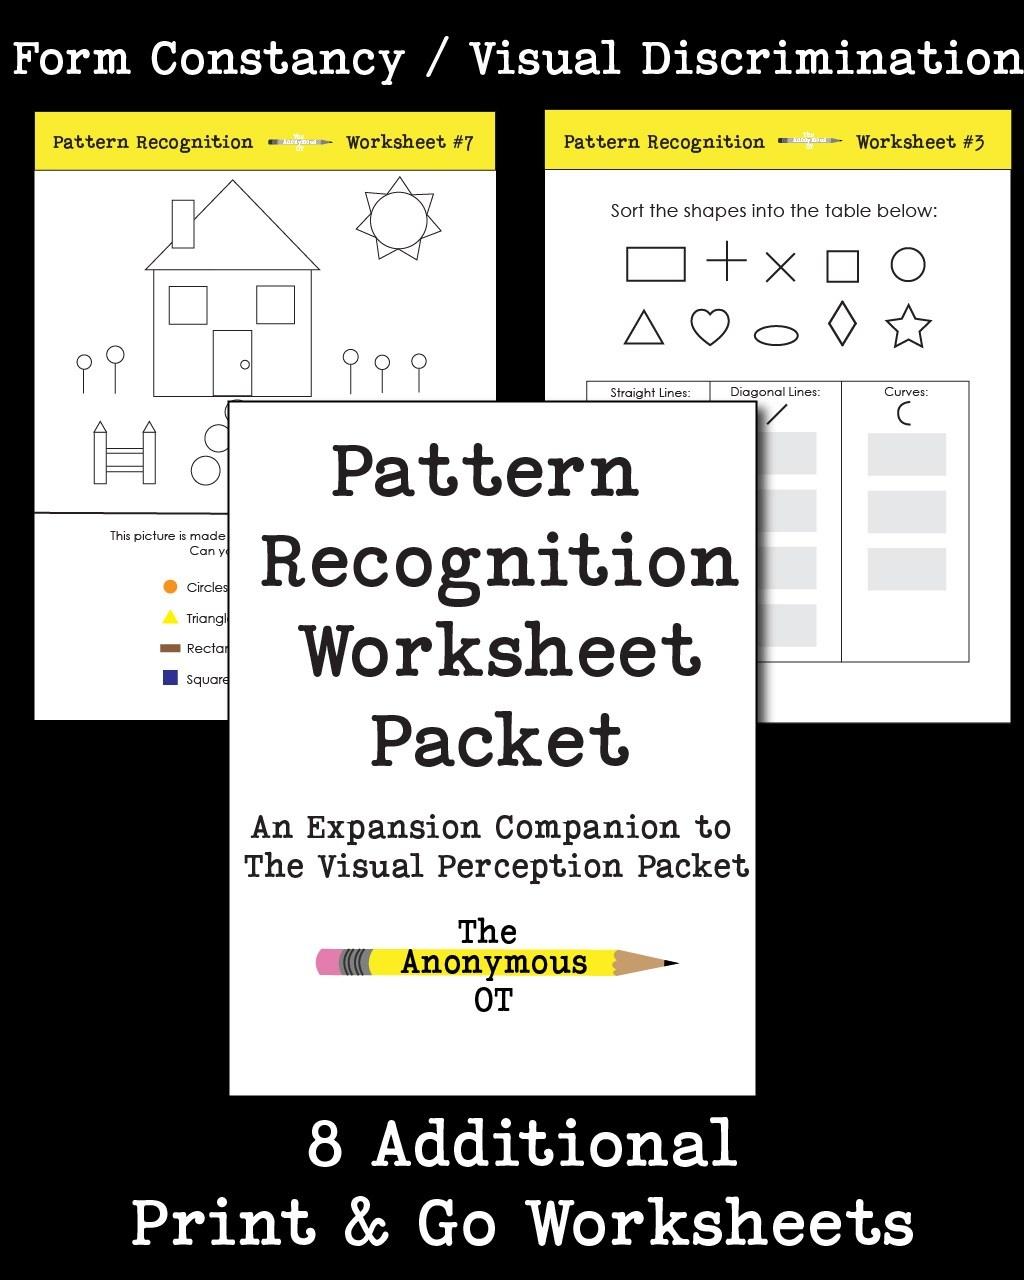 Free Printable Form Constancy Worksheets